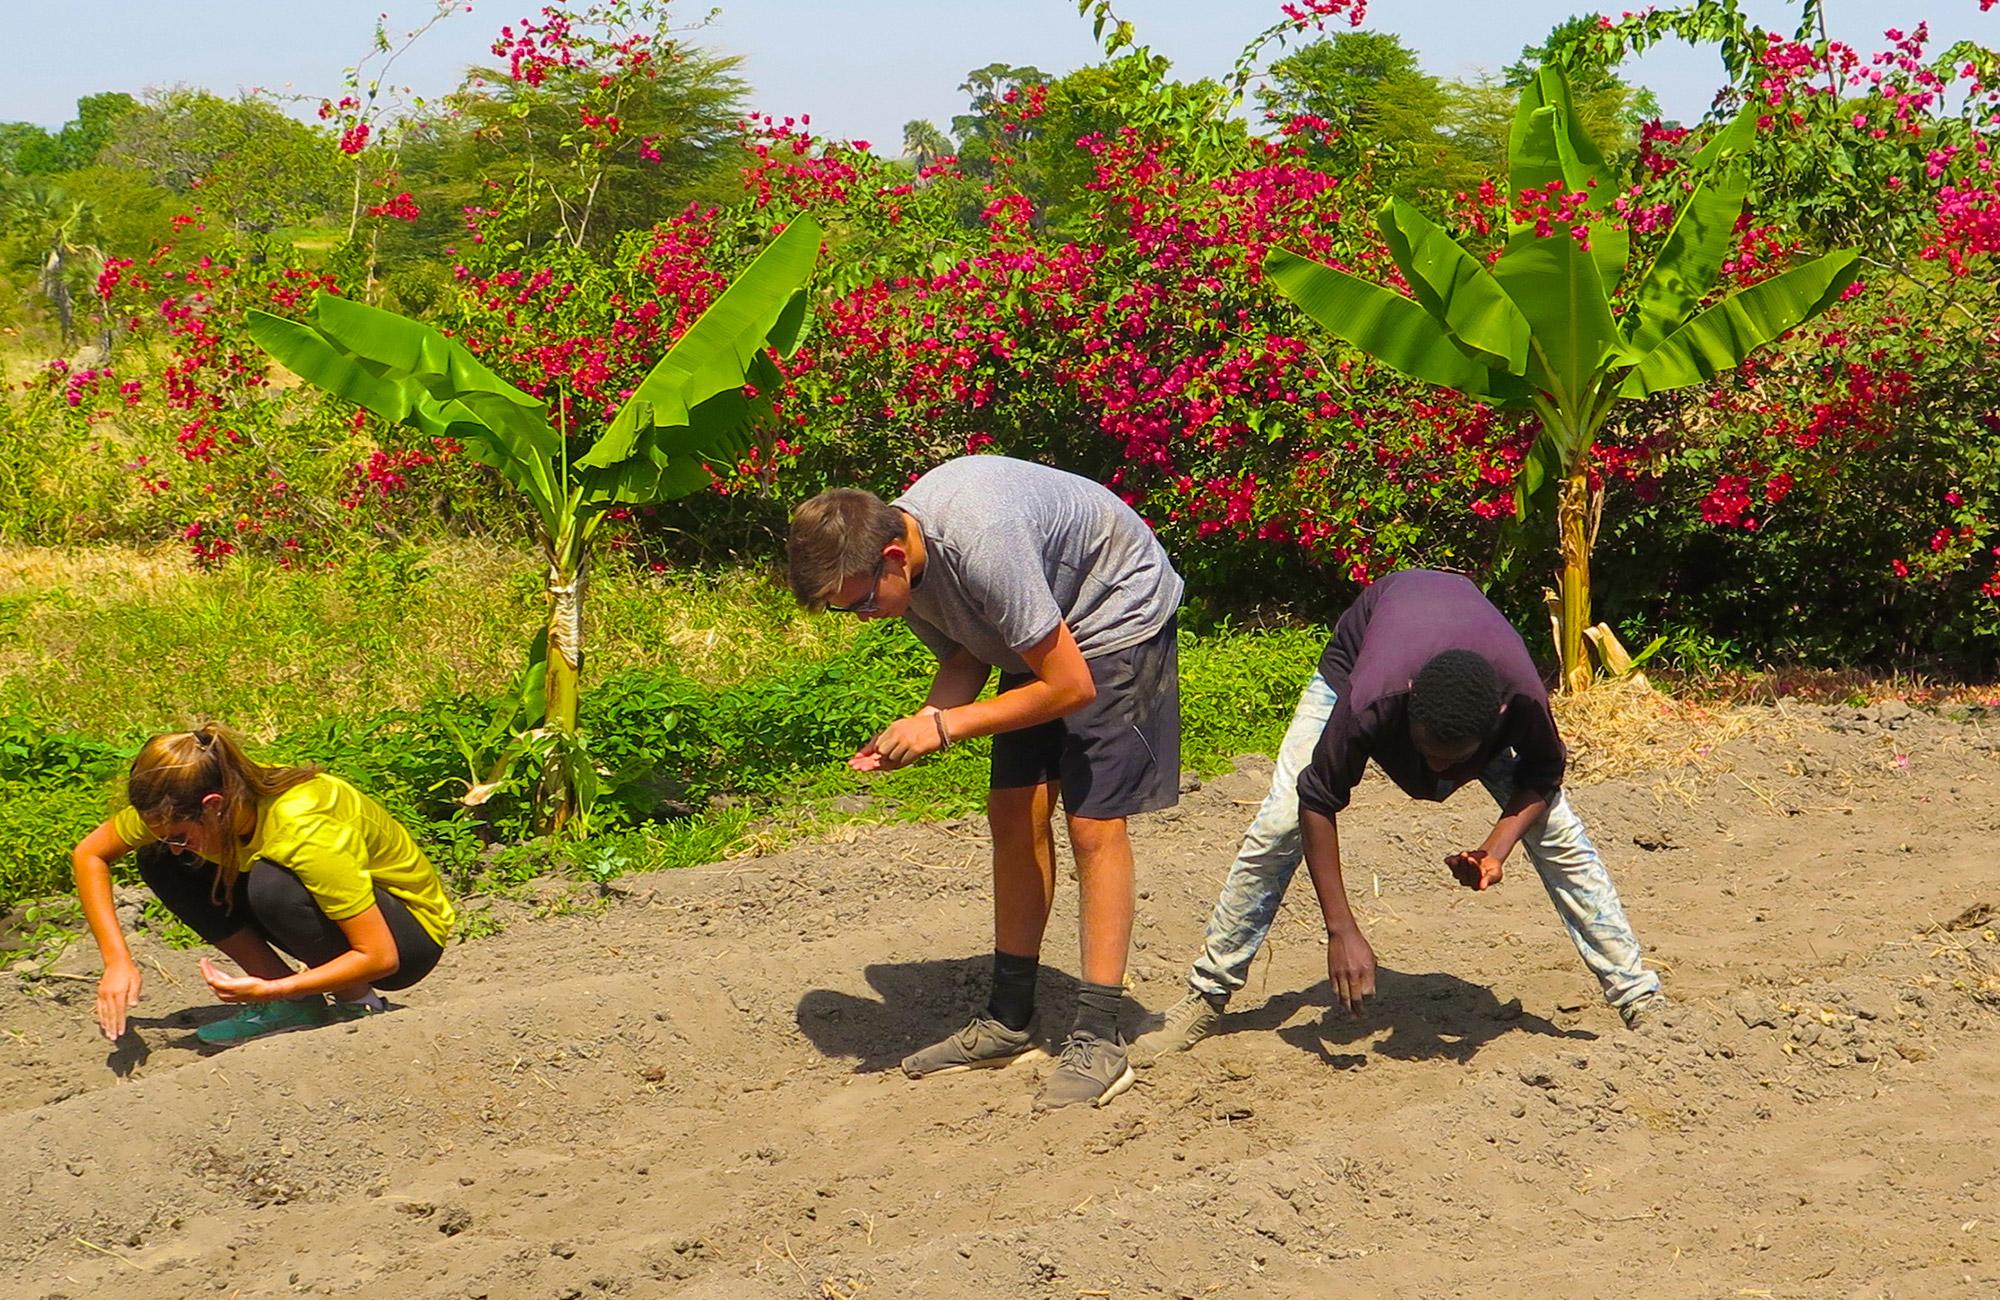 kilimanjaro community service project with moondance